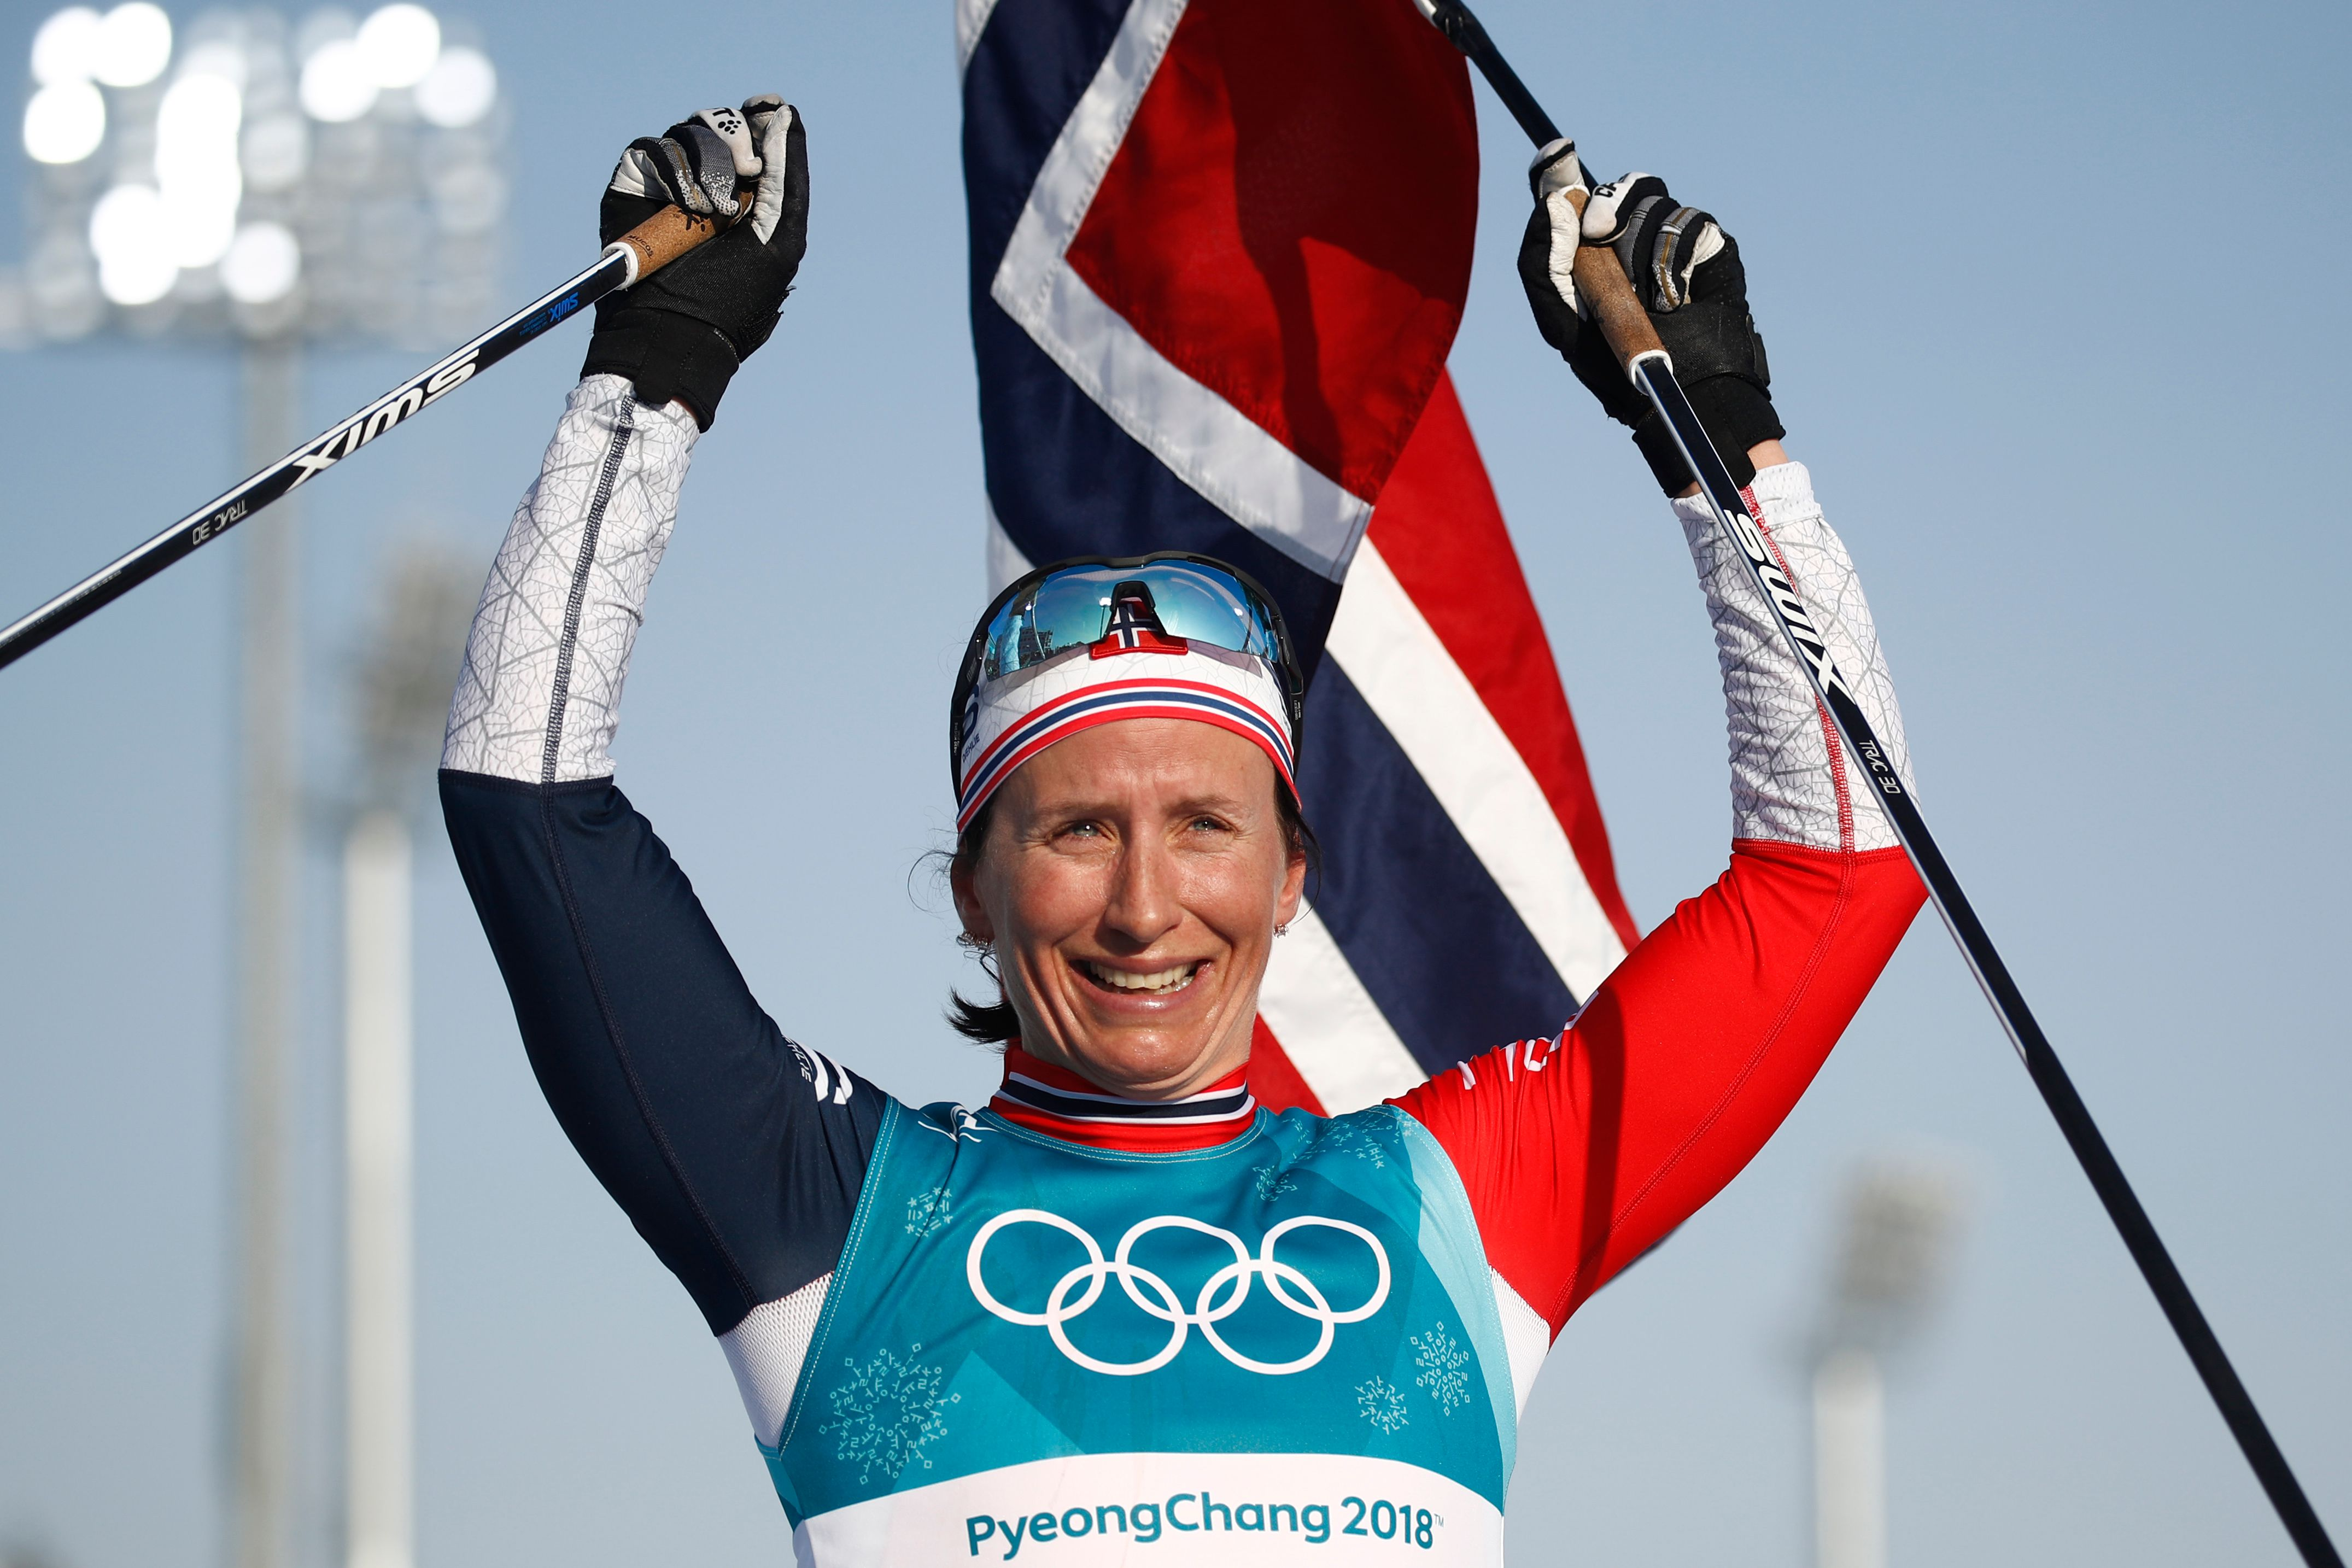 Nach Olympia-Rekord: Langlauf-Legende Marit Björgen beendet Karriere